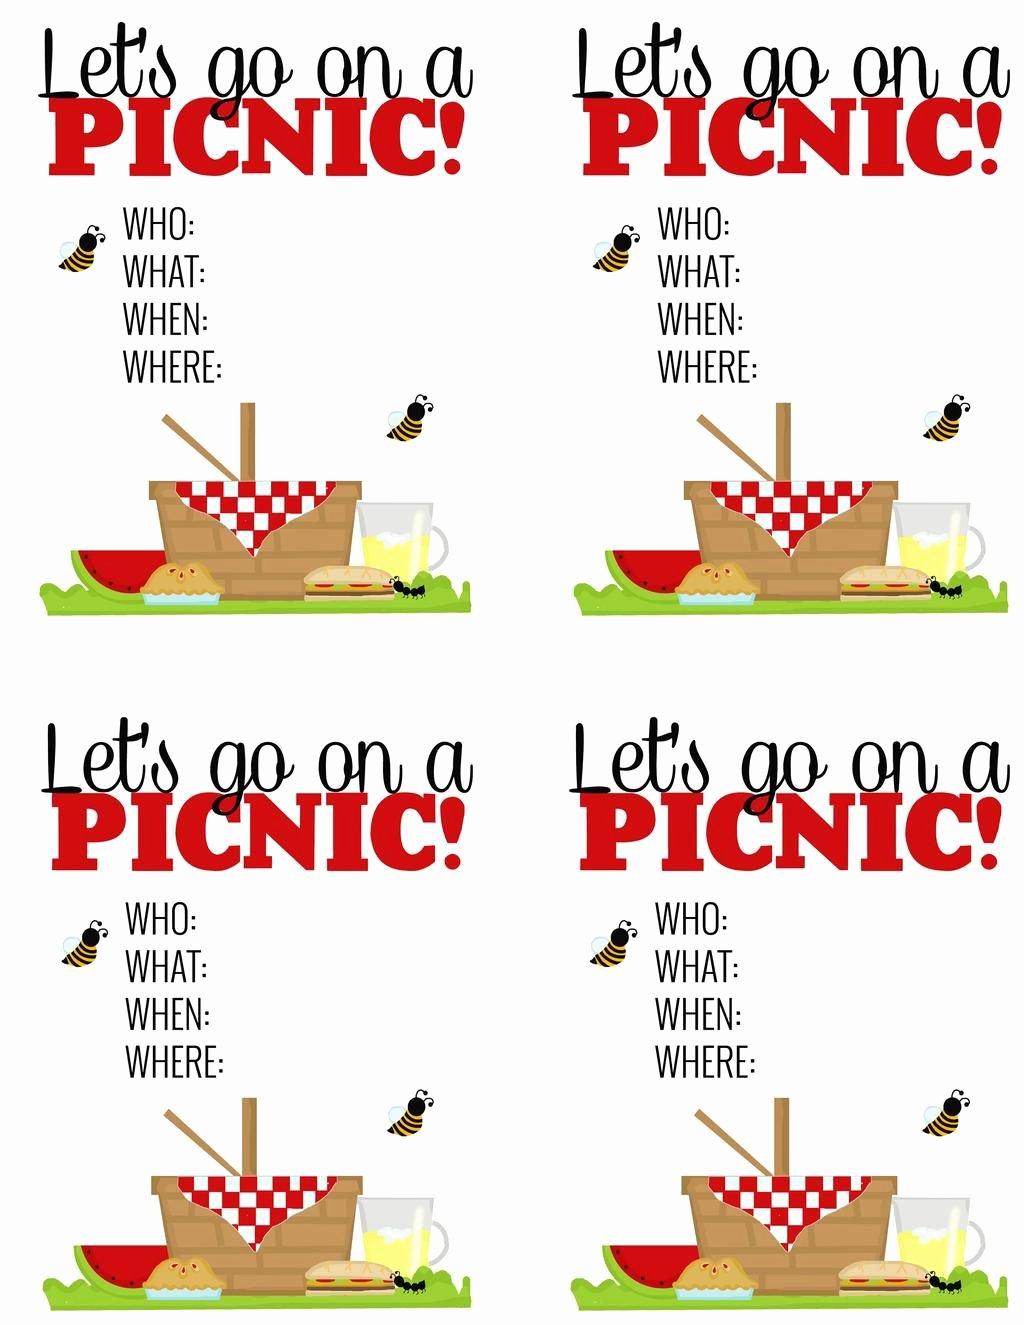 Free Picnic Invitation Template Inspirational Surprise Breakfast Picnic Free Printable Picnic